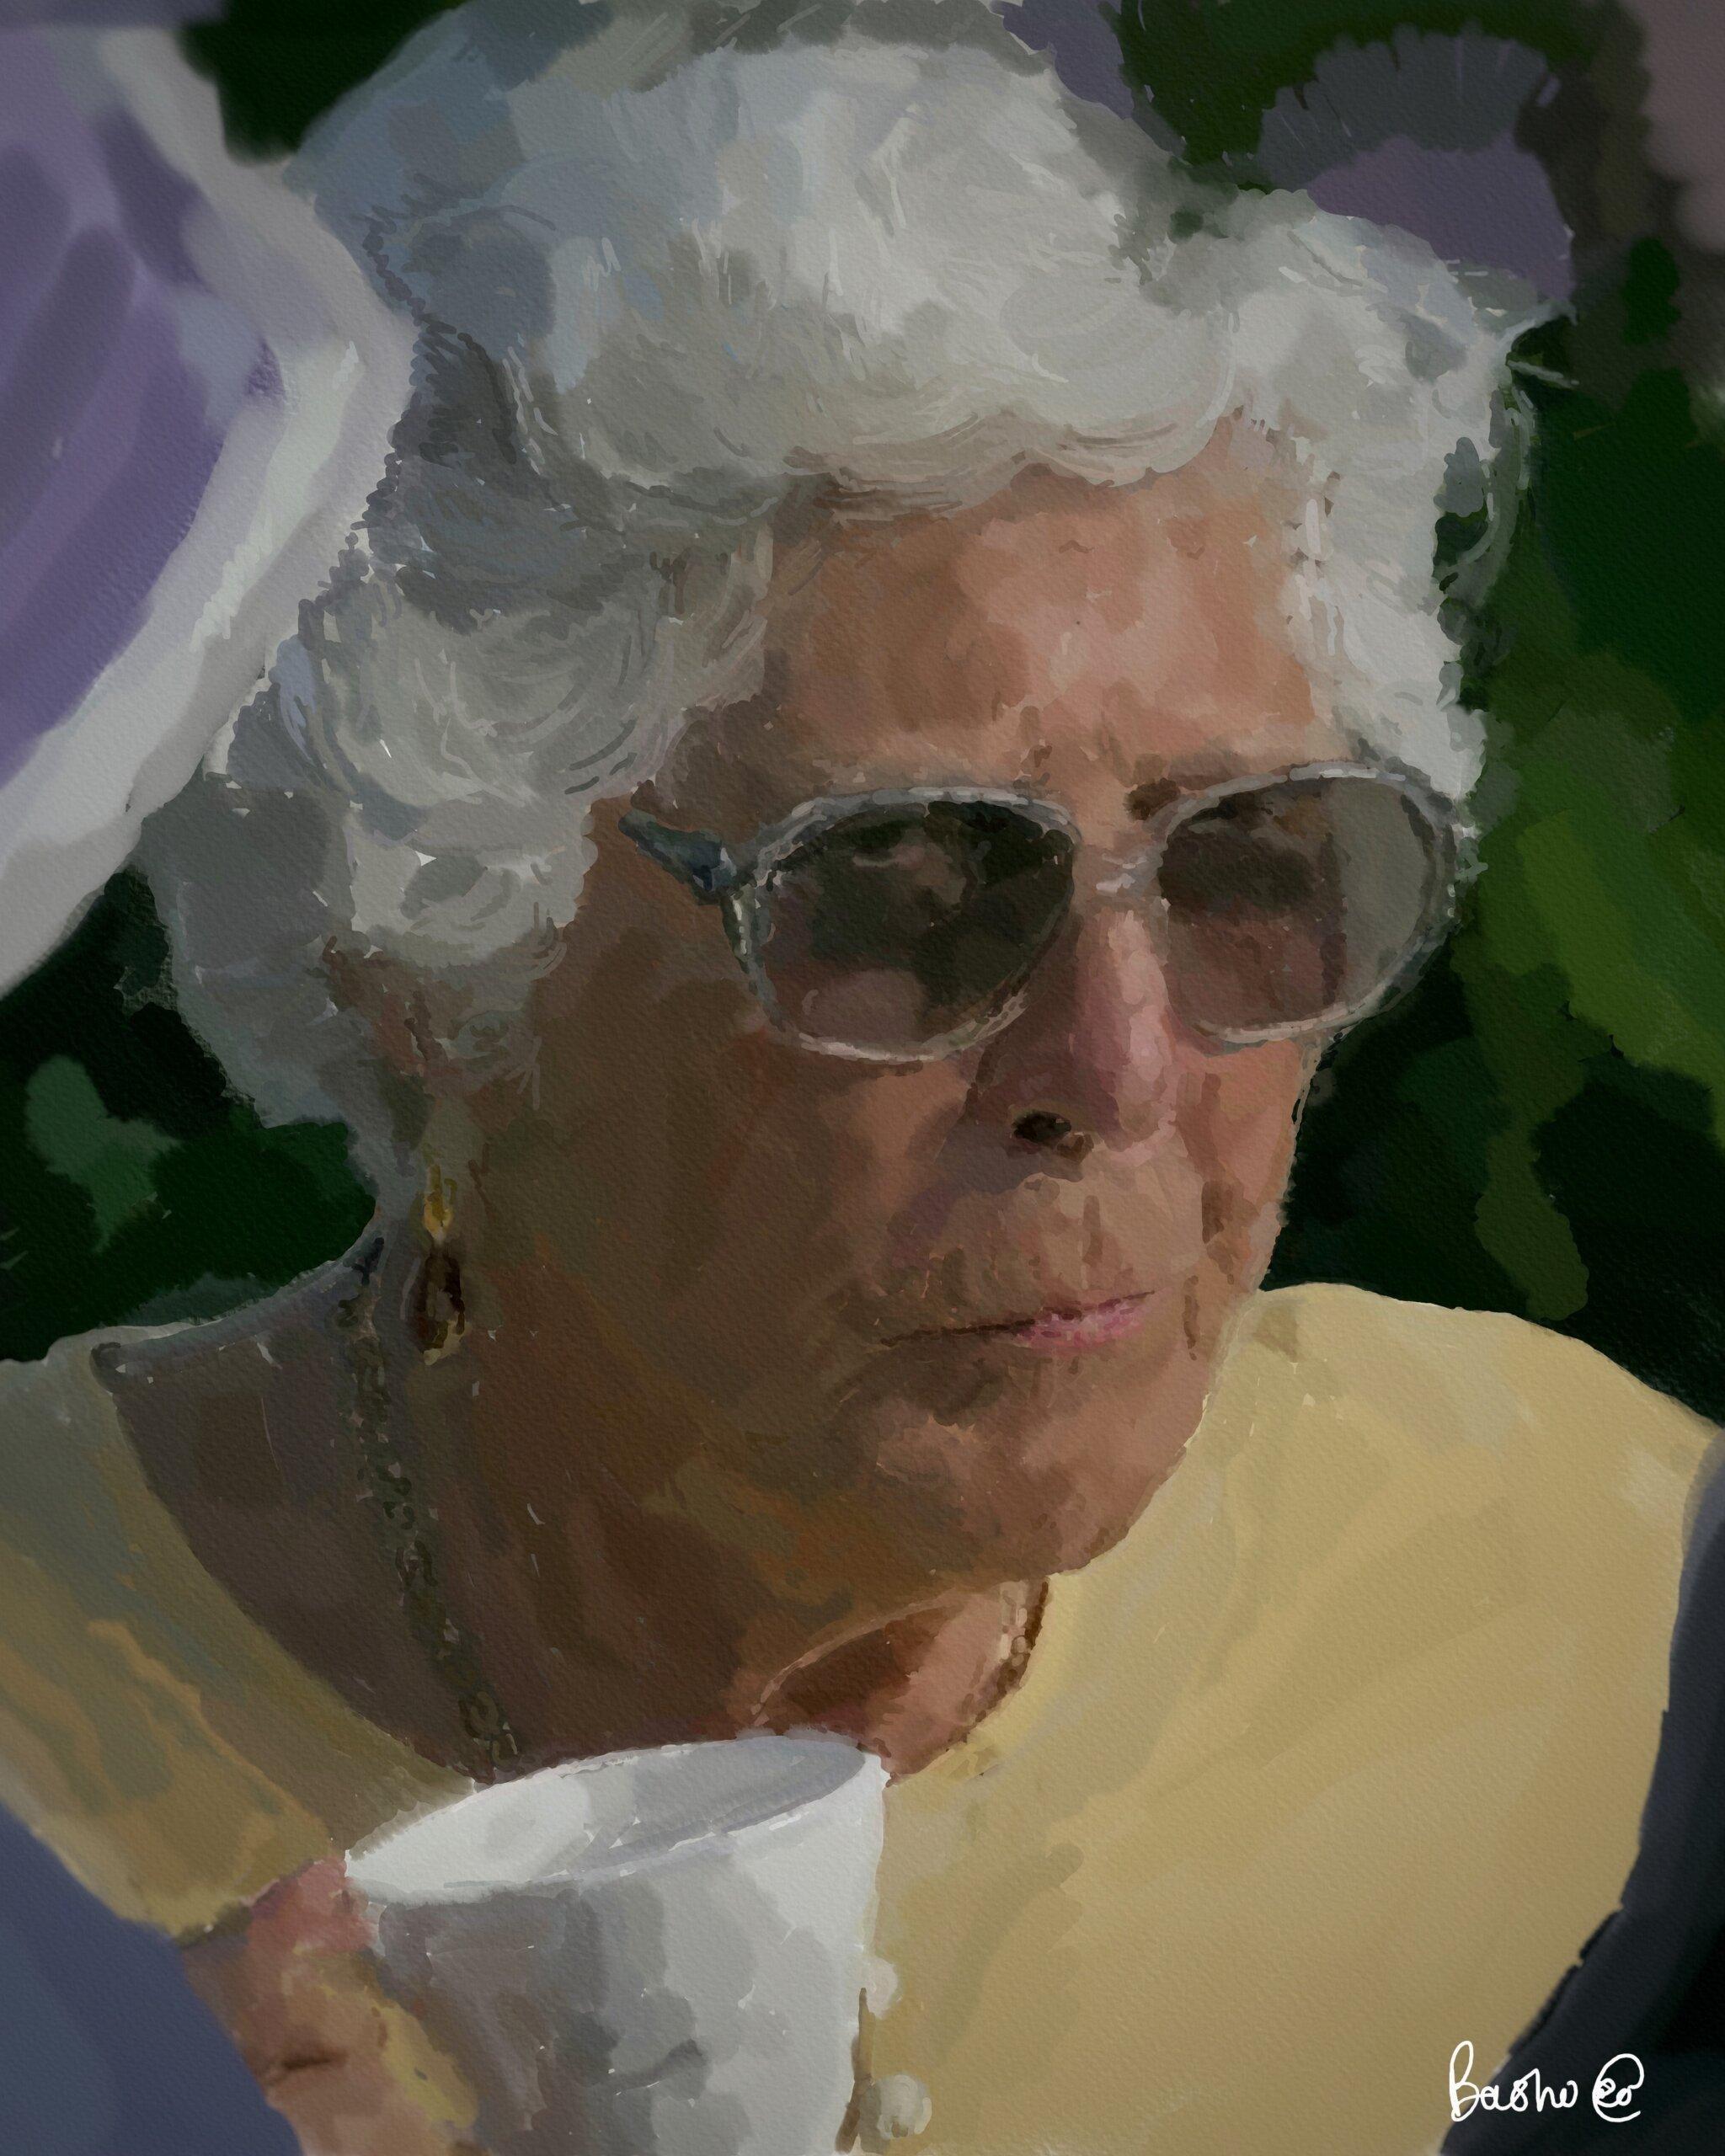 Grandma at the wedding